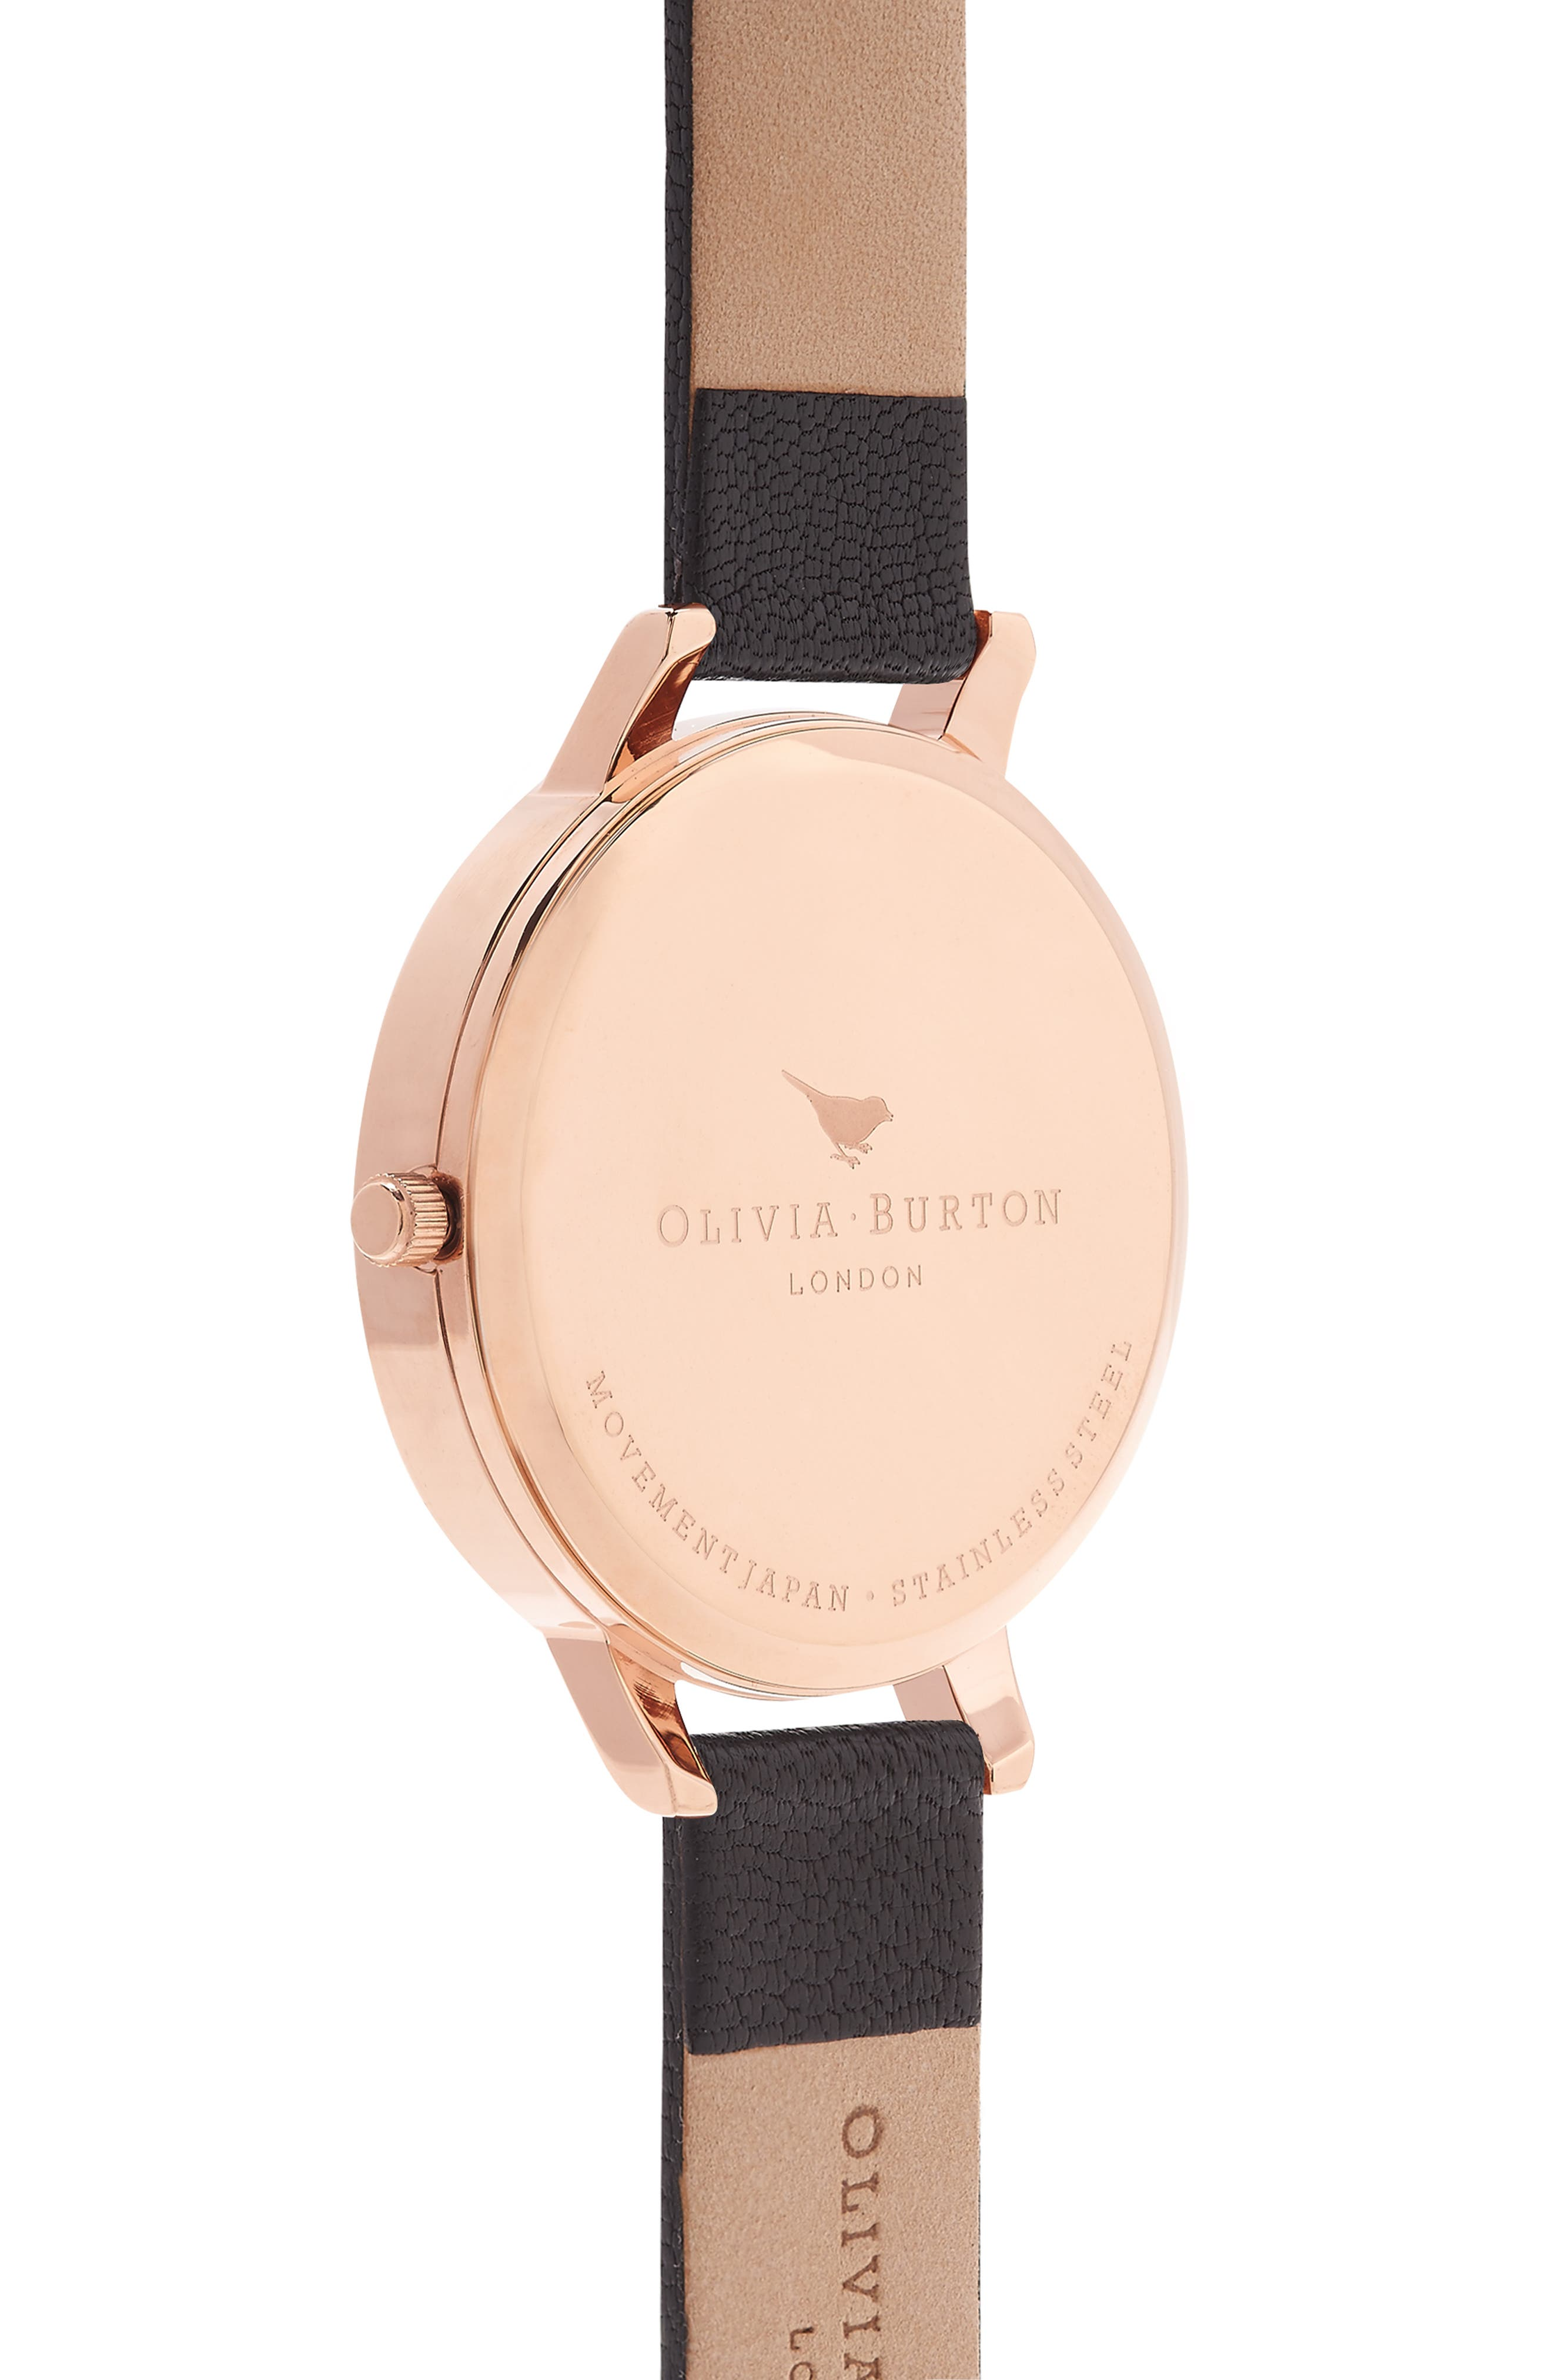 OLIVIA BURTON, Big Dial Leather Strap Watch, 38mm, Alternate thumbnail 3, color, BLACK/ BLACK/ ROSE GOLD